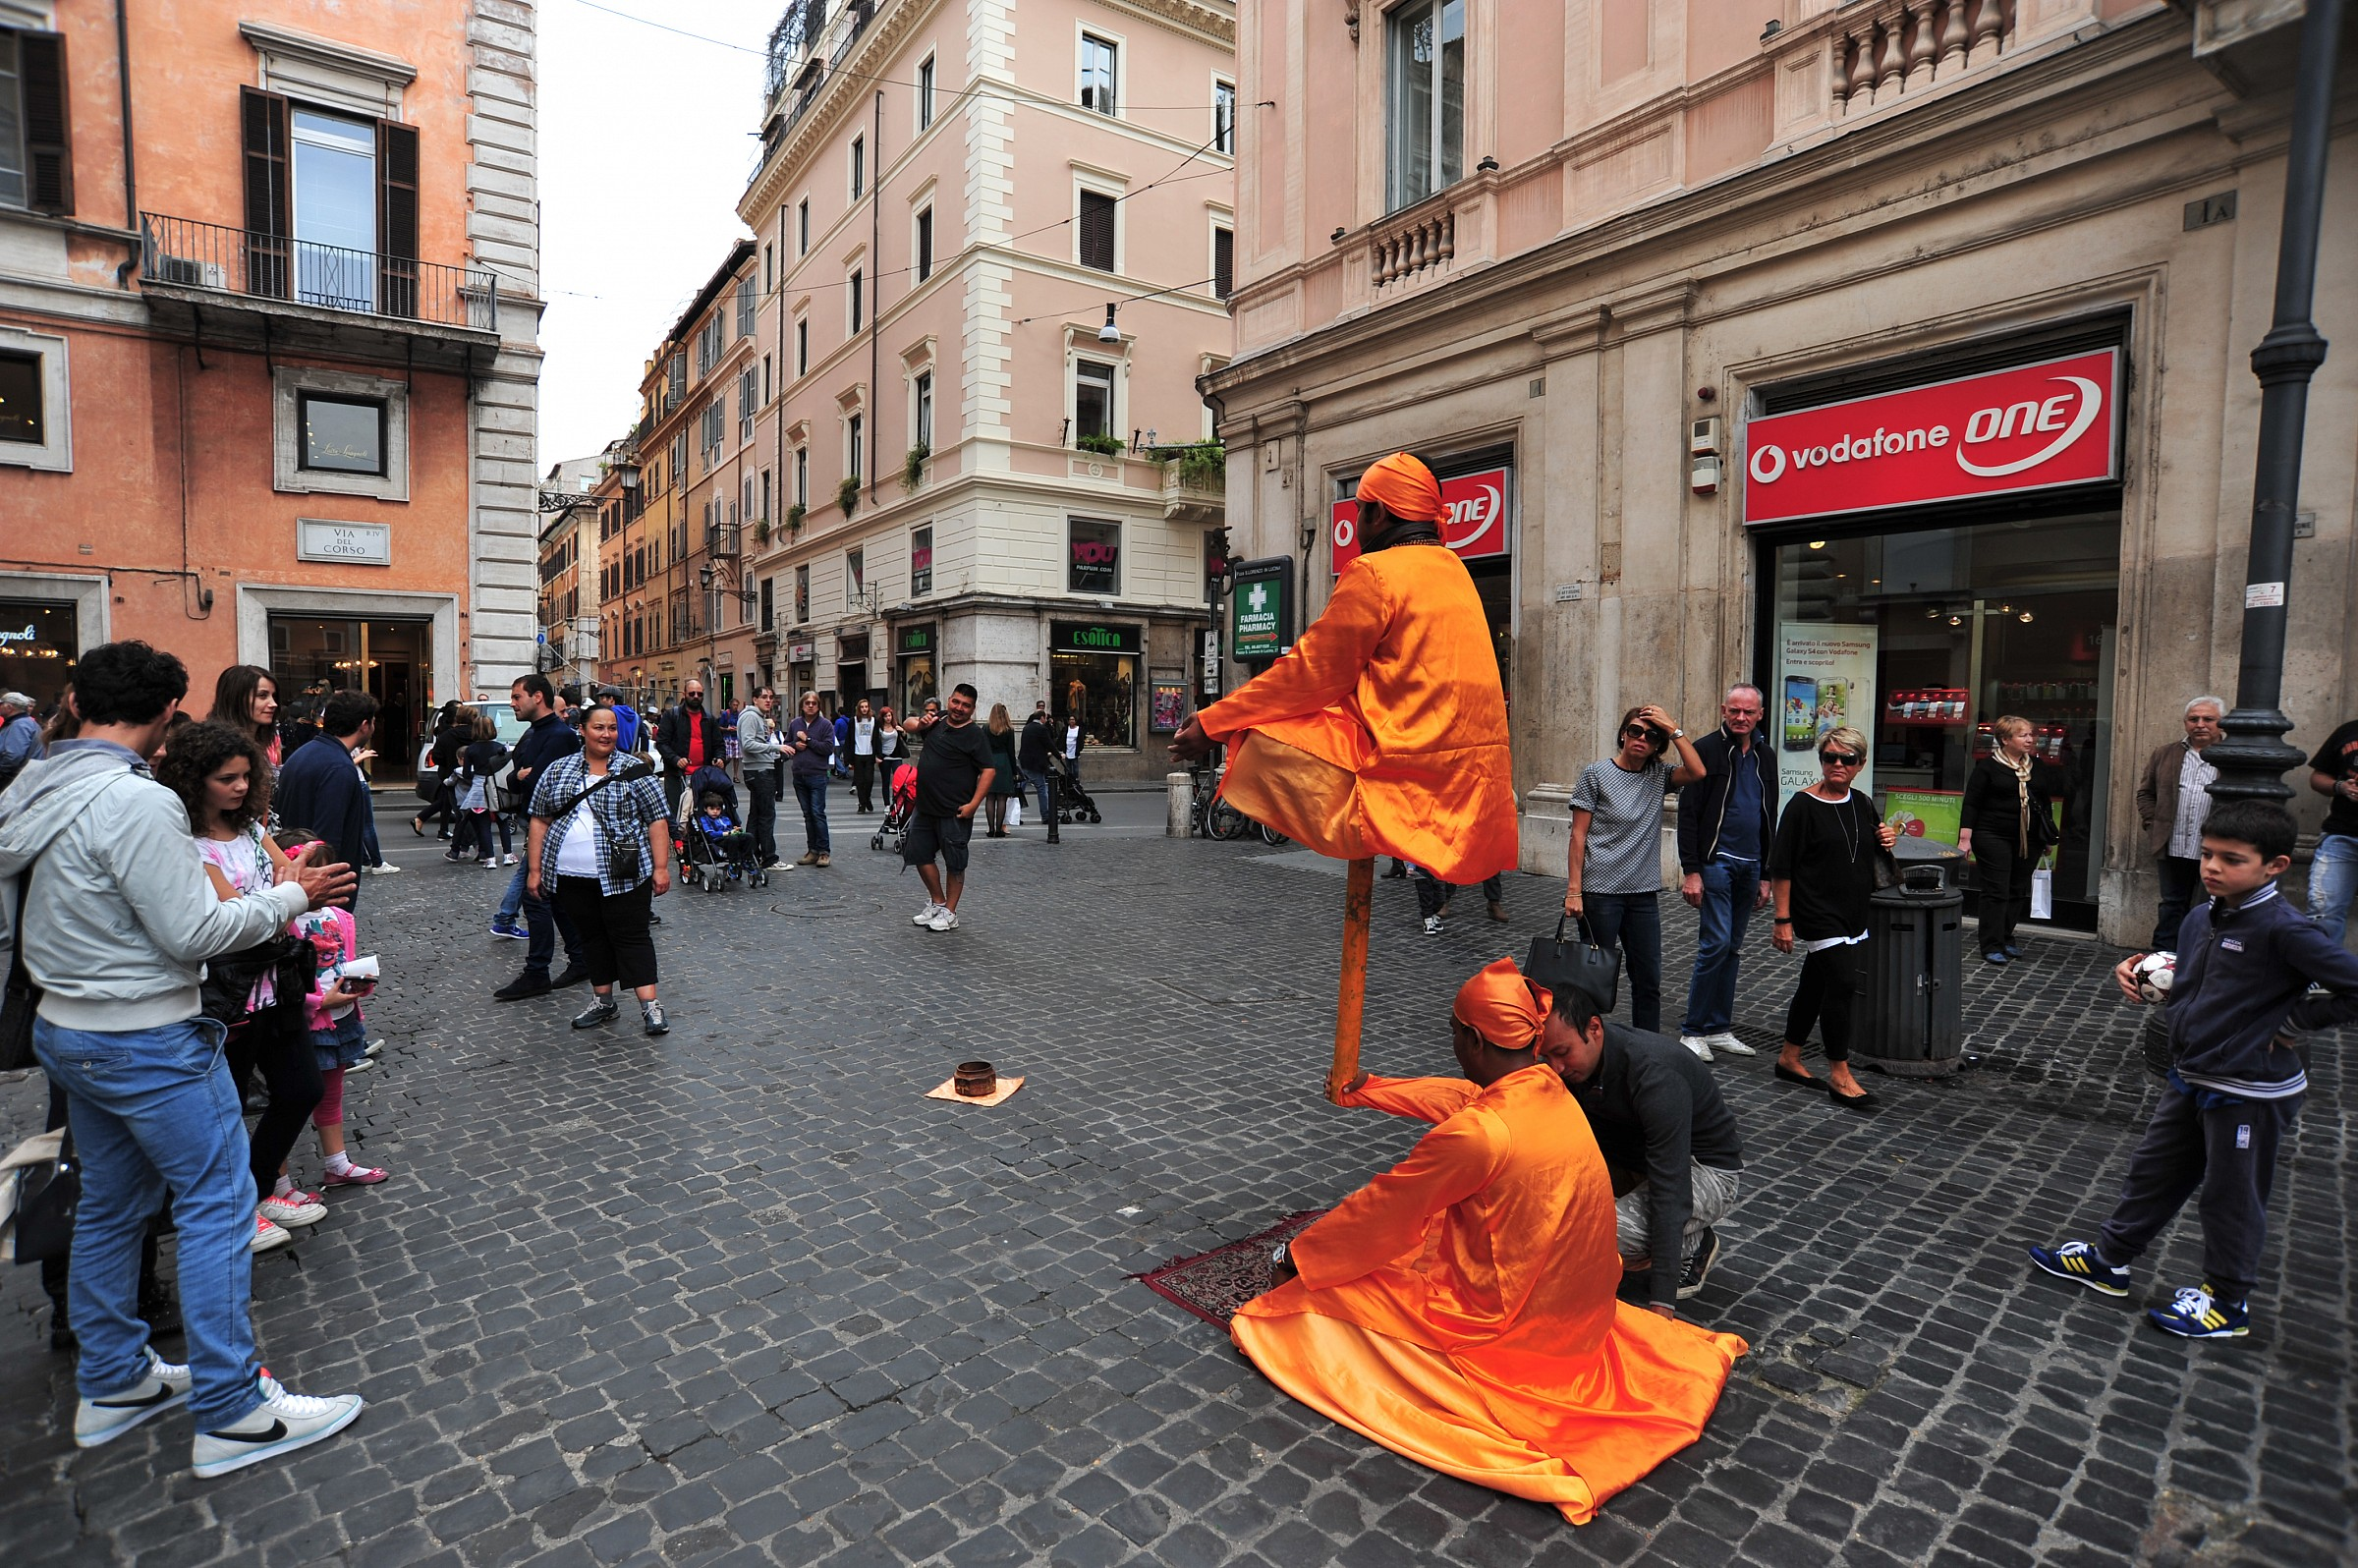 Mistero a Roma -Braccia fortissime...